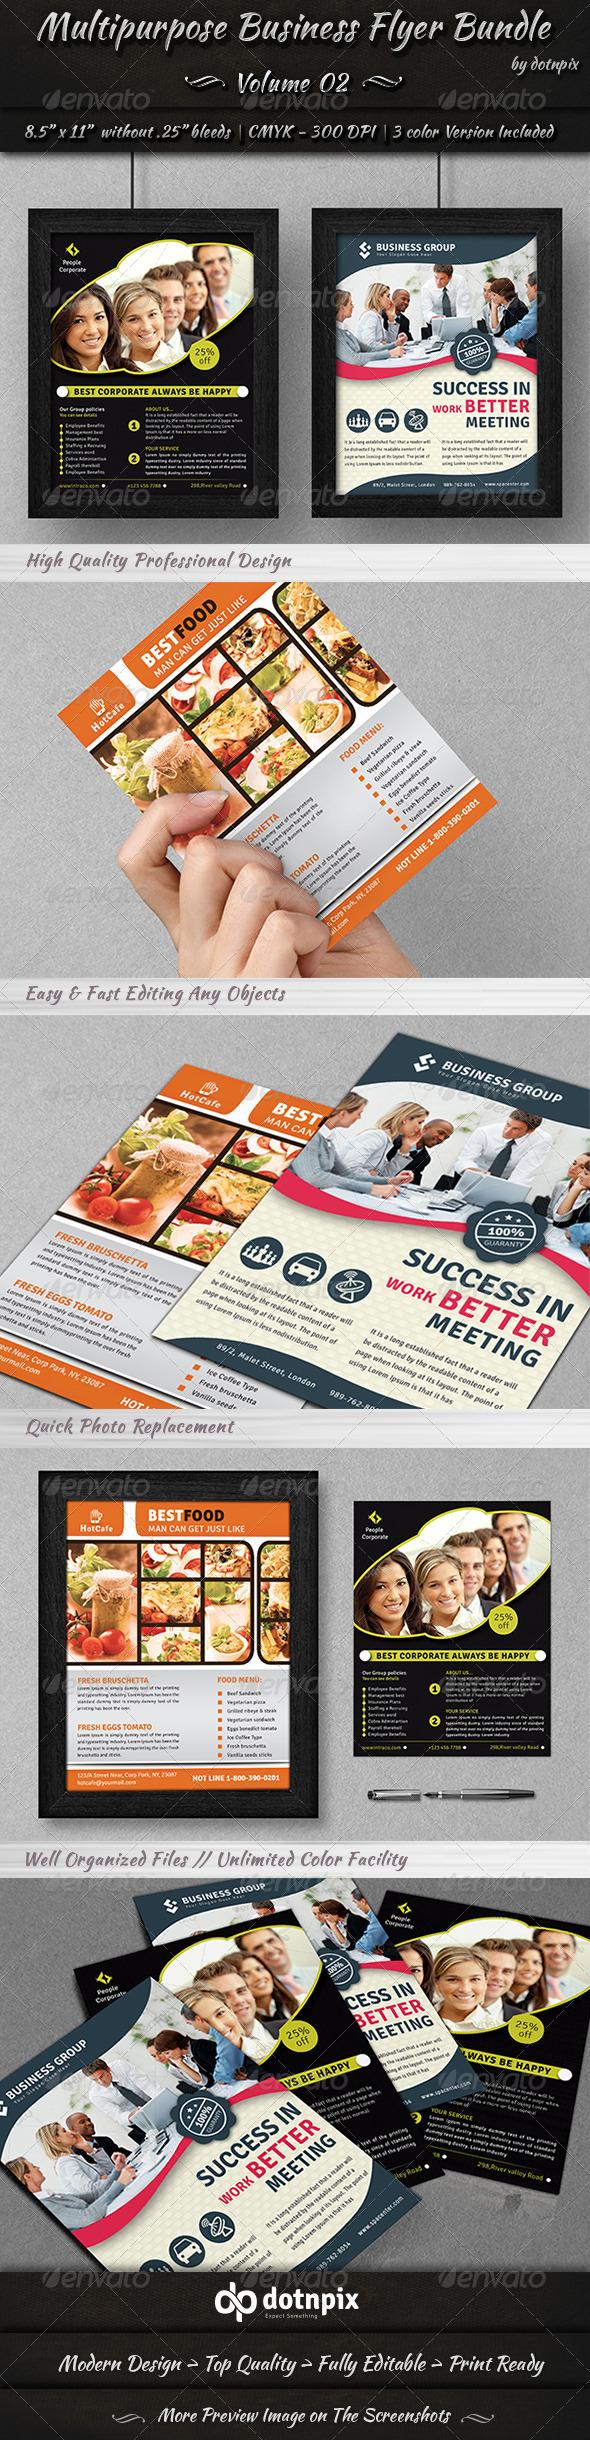 Multipurpose Business Flyer Bundle | Volume 2 - Corporate Flyers